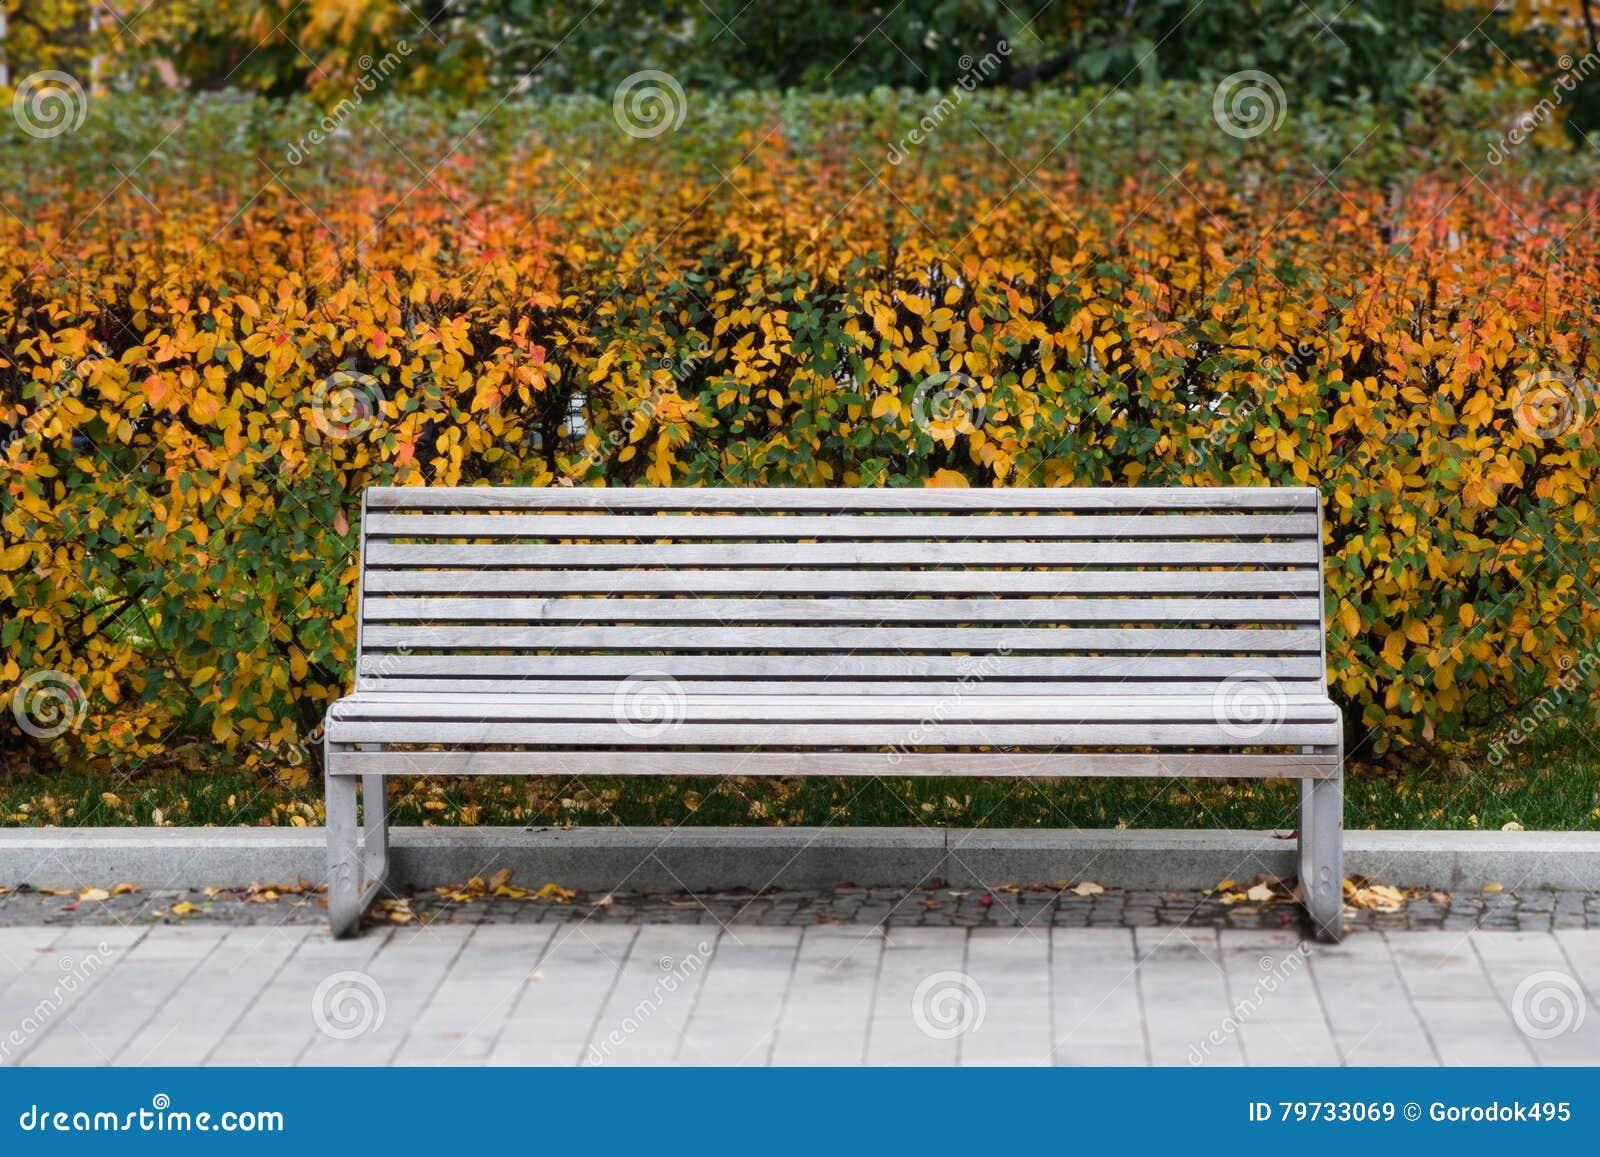 White Bench In The Park. Autumn Scene Still Life. Colorful